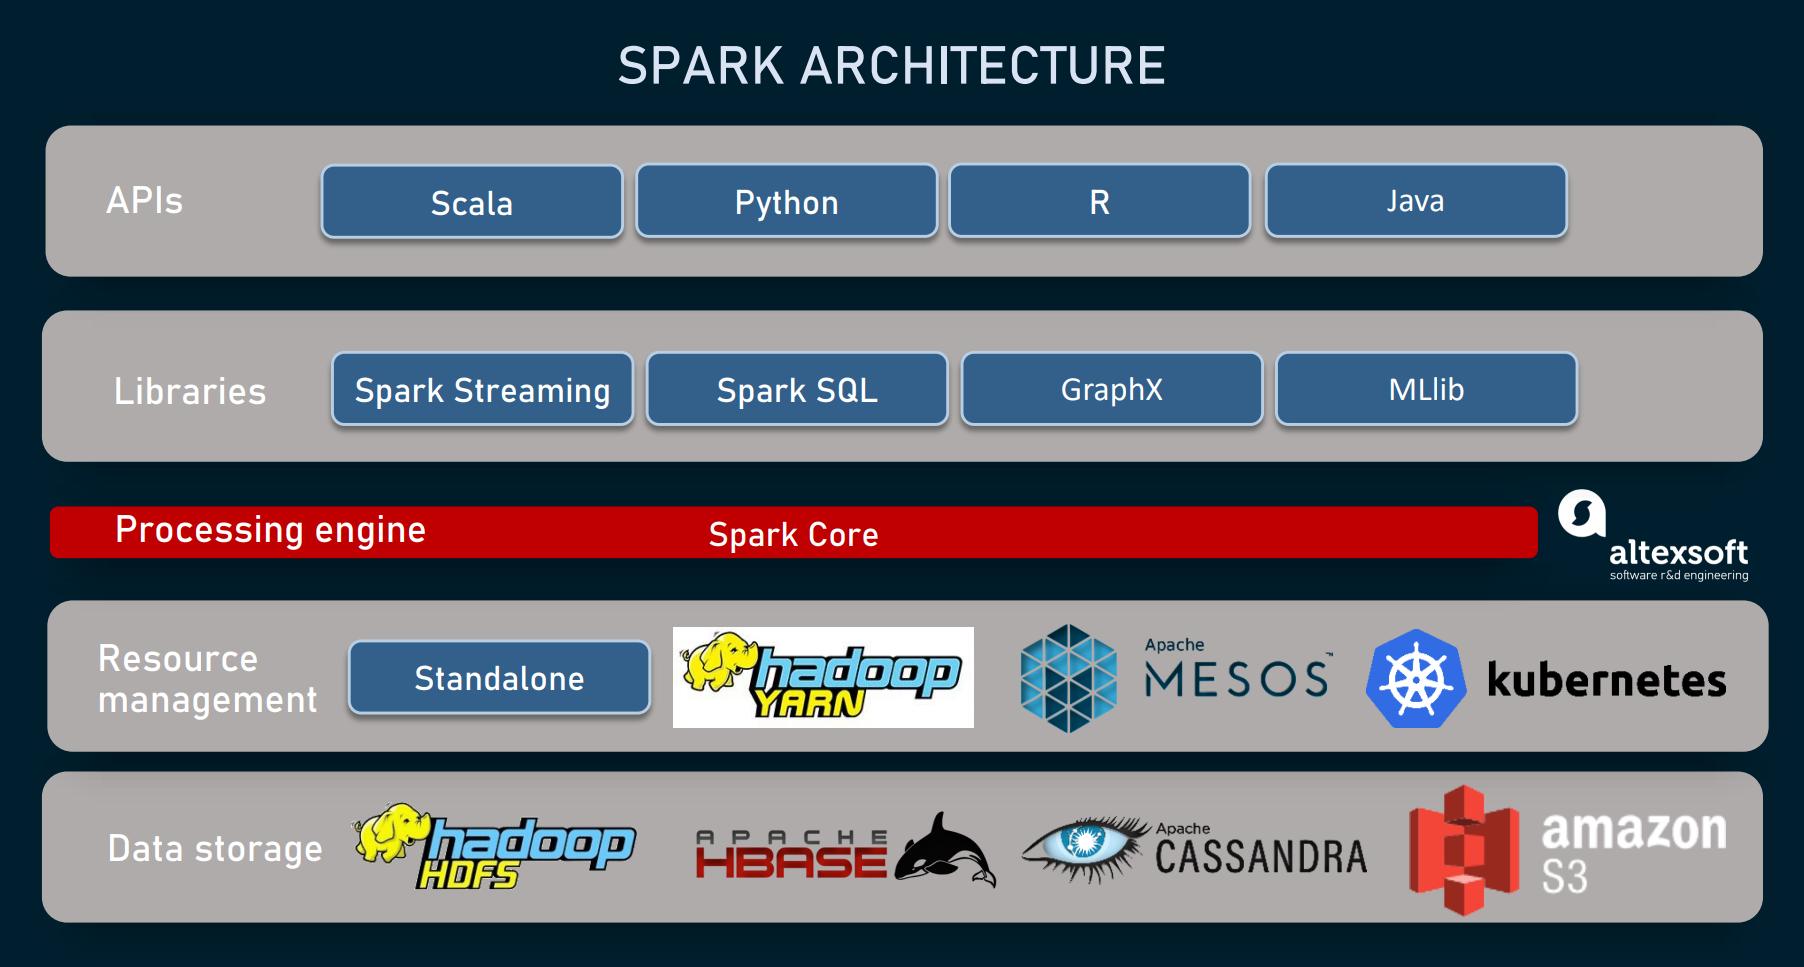 Spark architecture